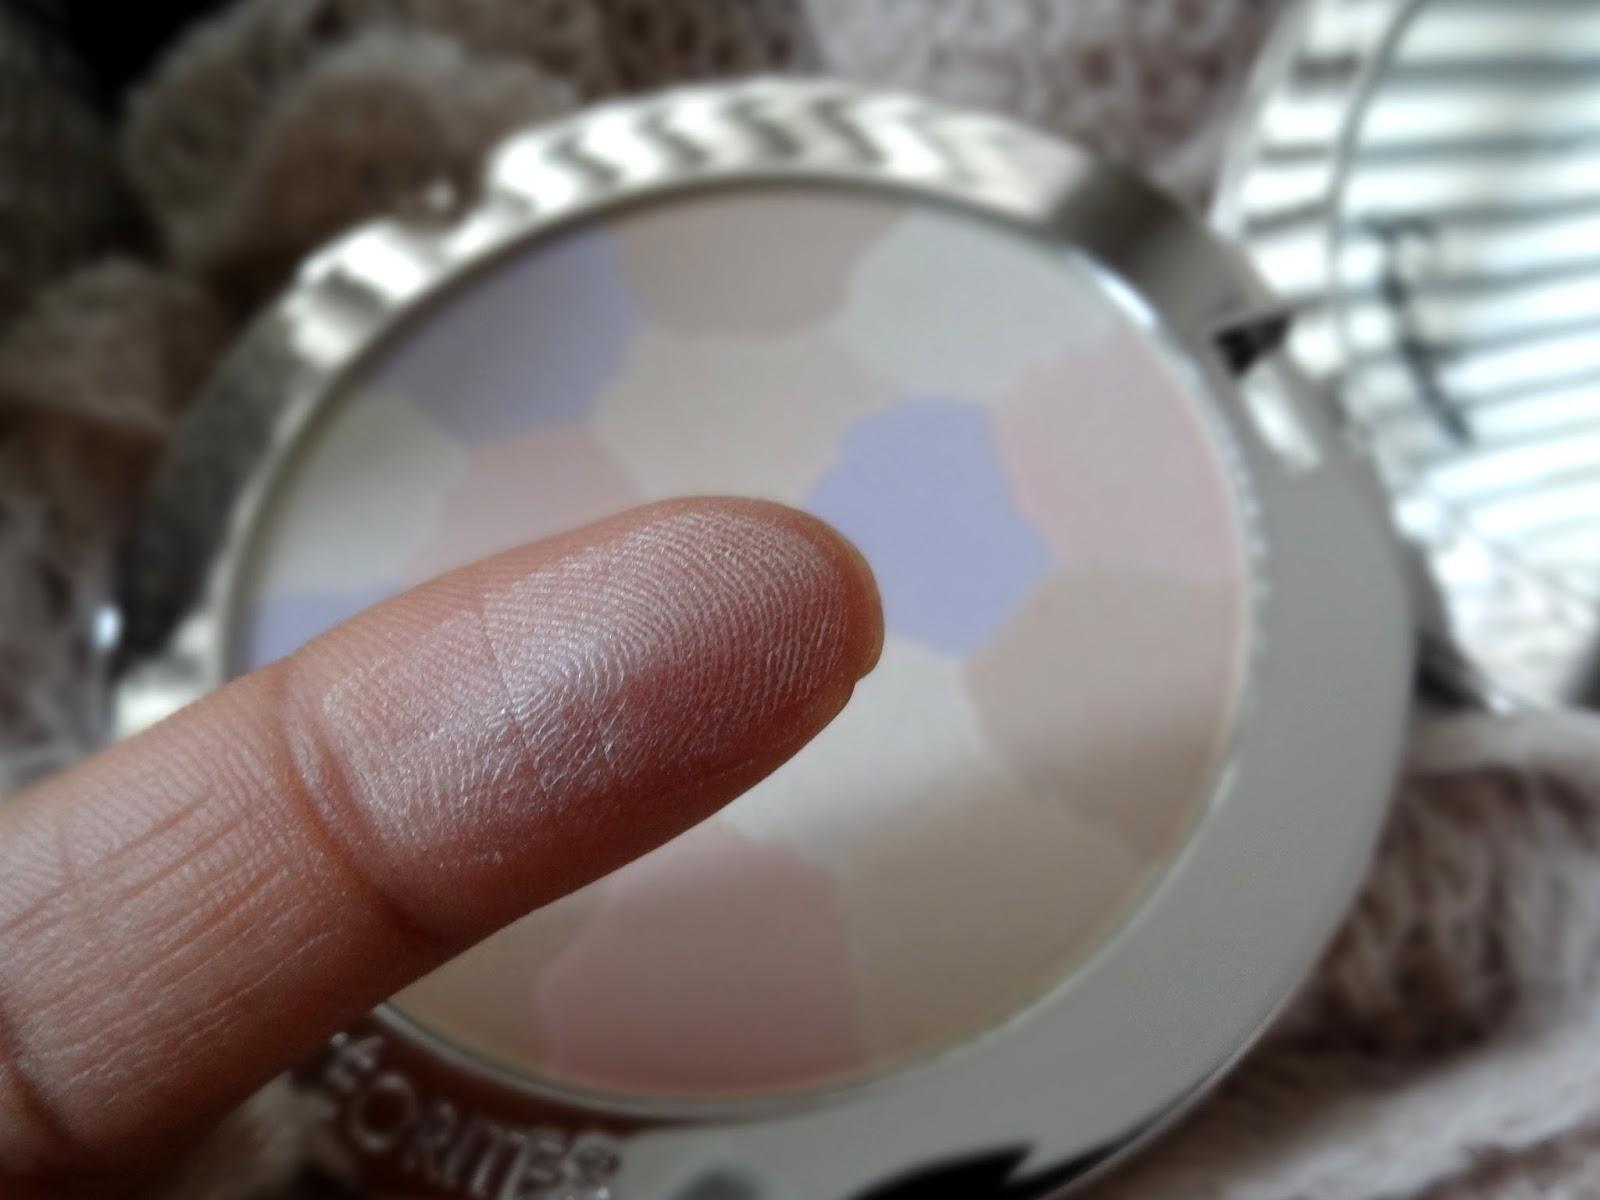 Guerlain Meteorites Compact Medium 03 Swatch